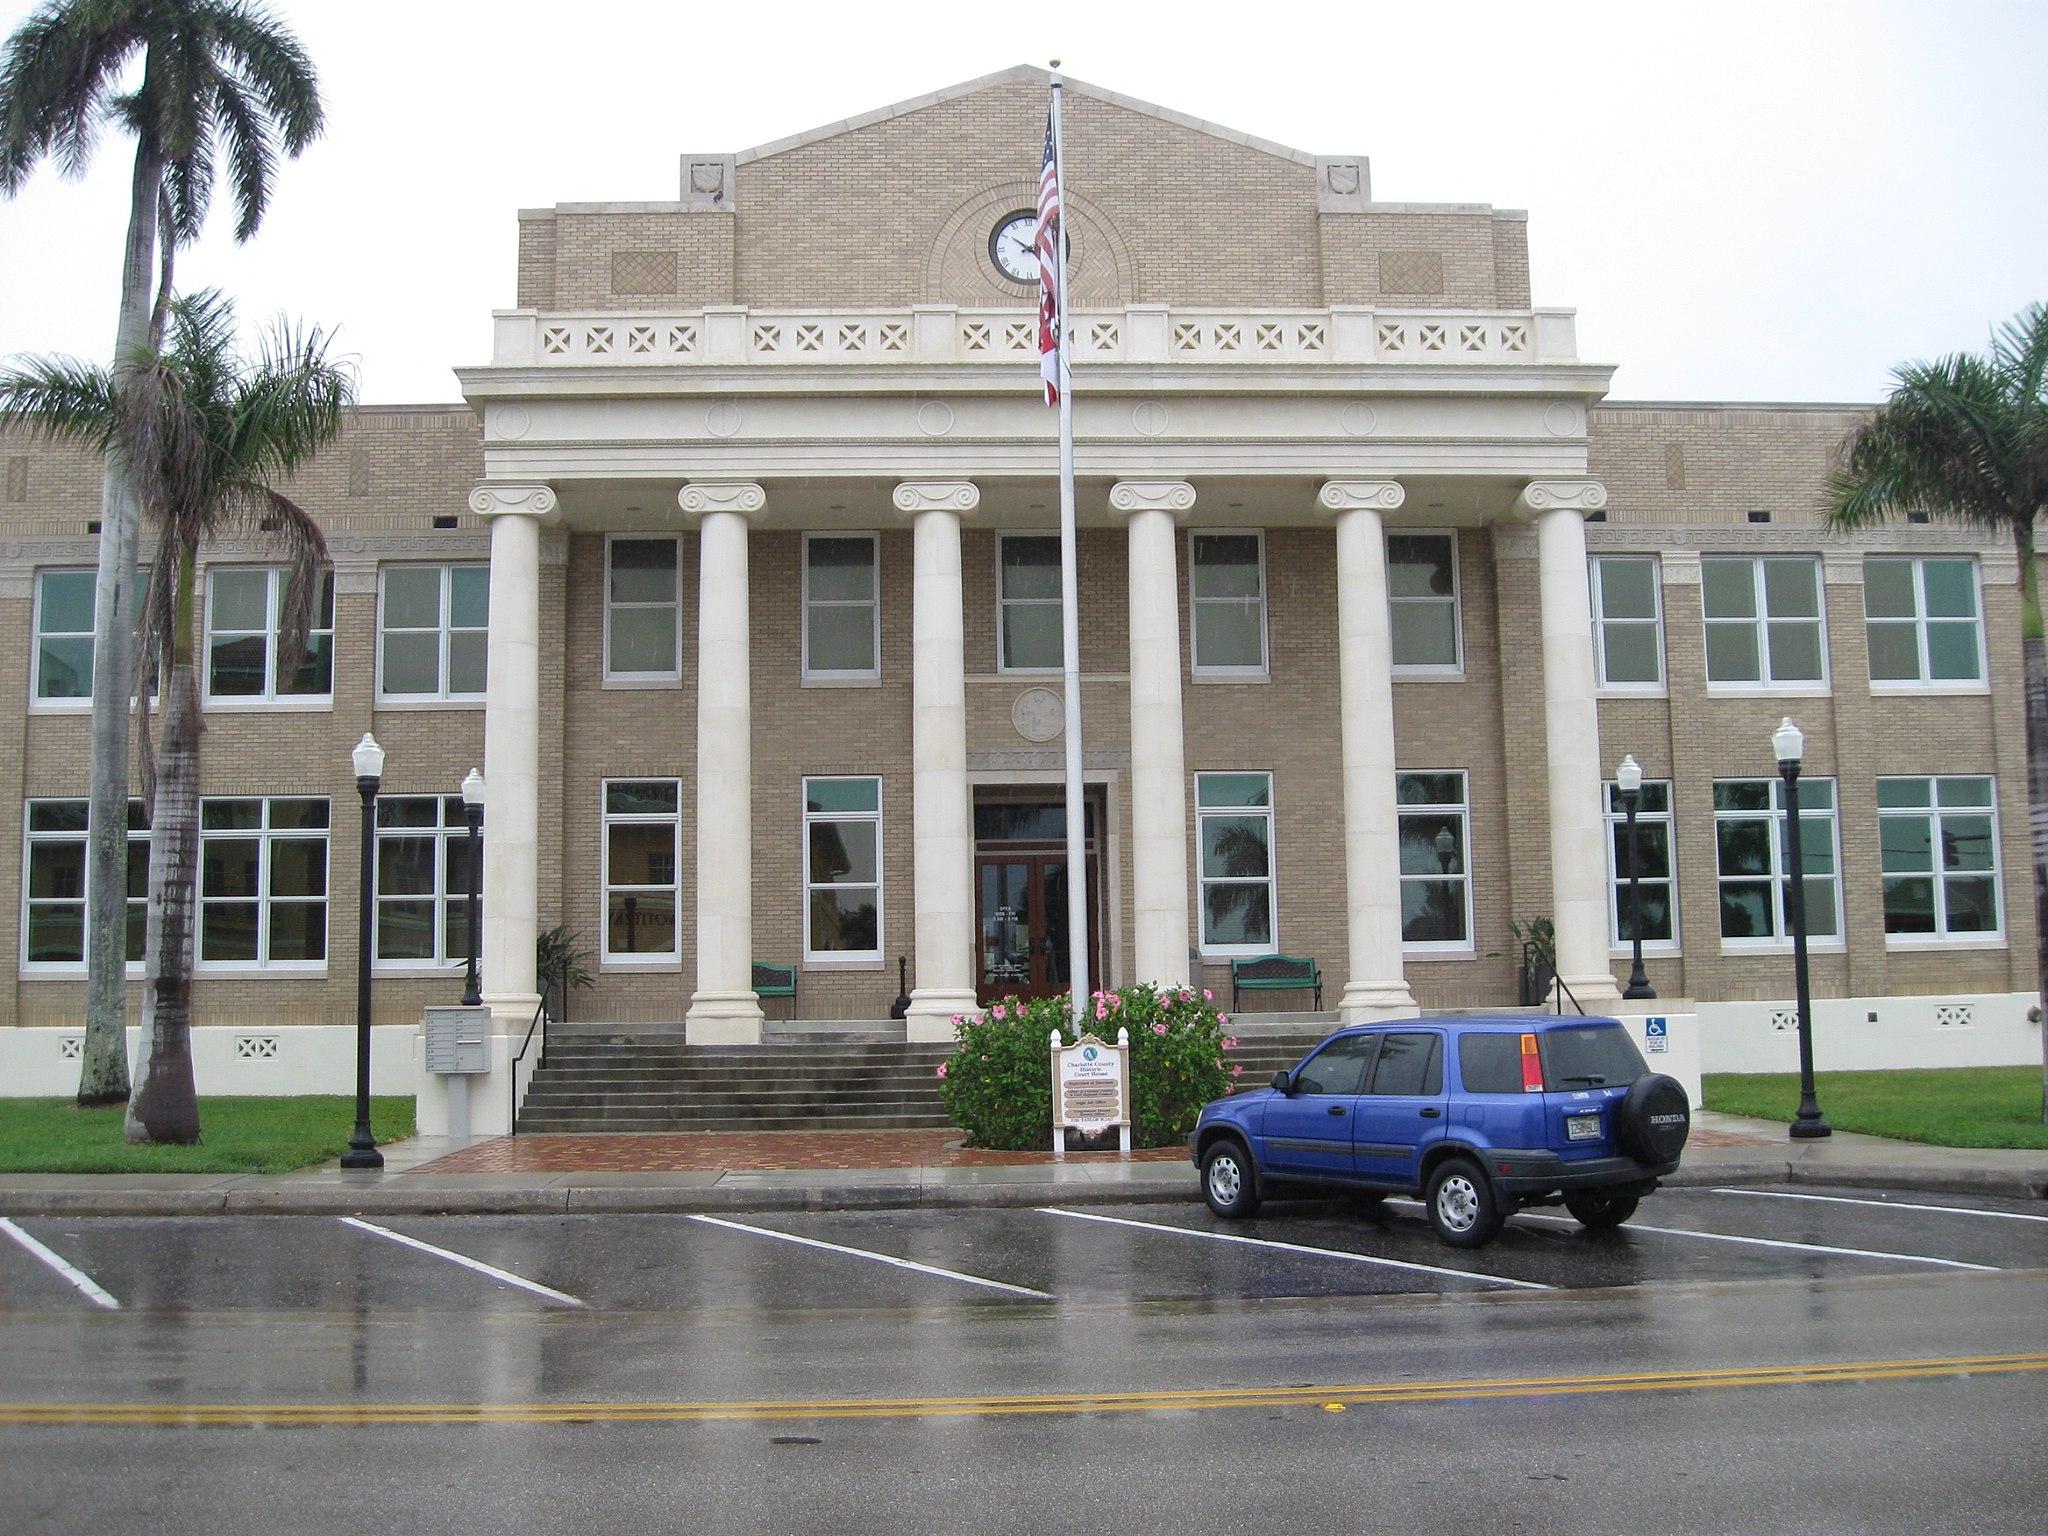 Punta Gorda, FL, Courthouse, Charlotte County, 04-18-2010 (1)